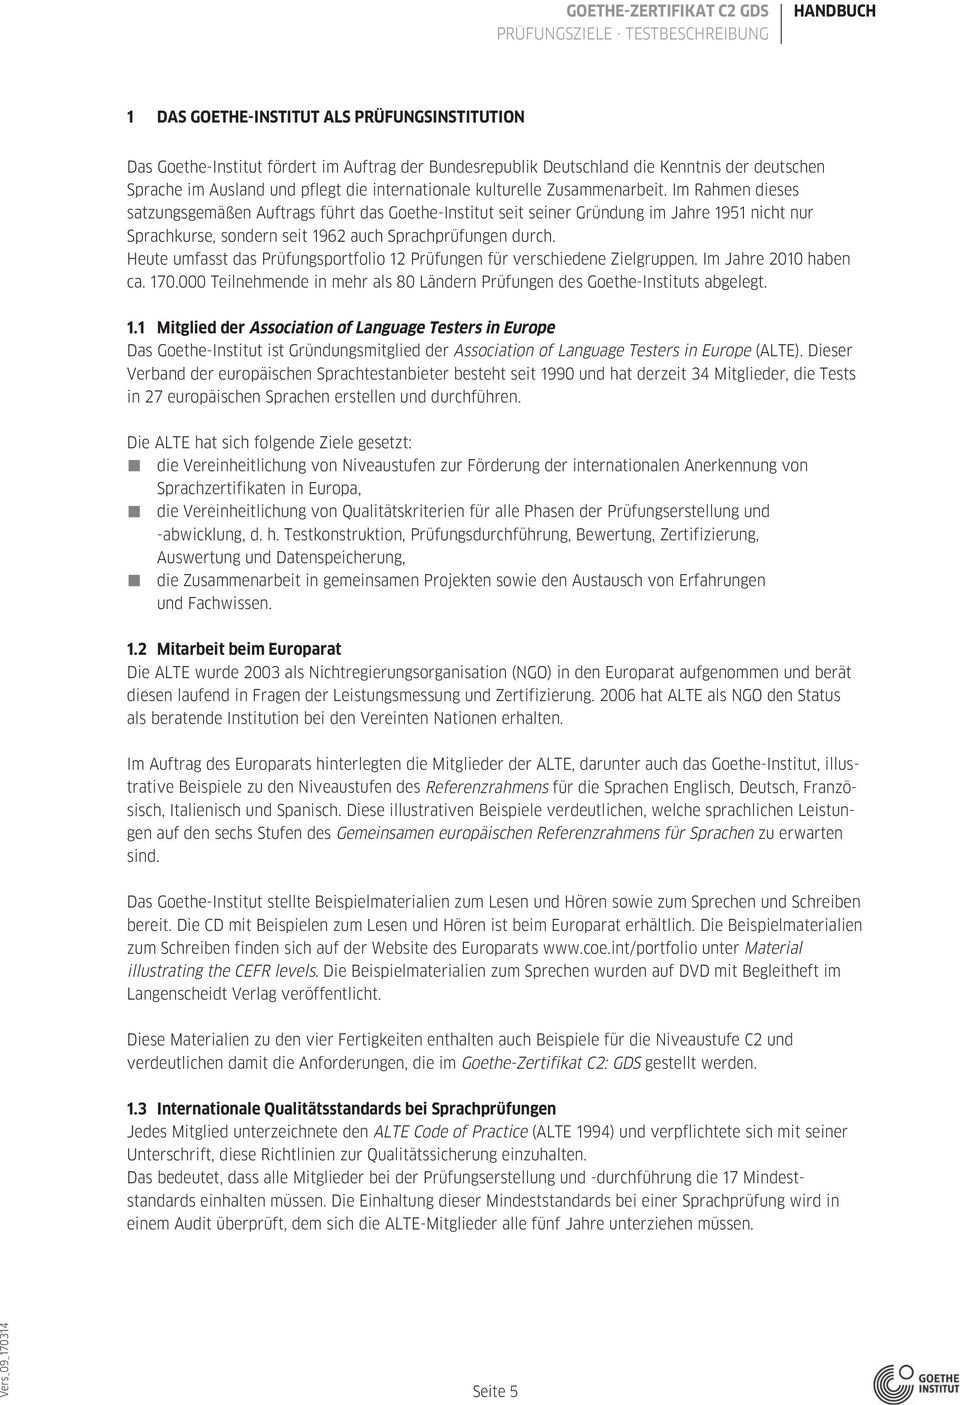 Goethe Zertifikat C2 Pdf Kostenfreier Download